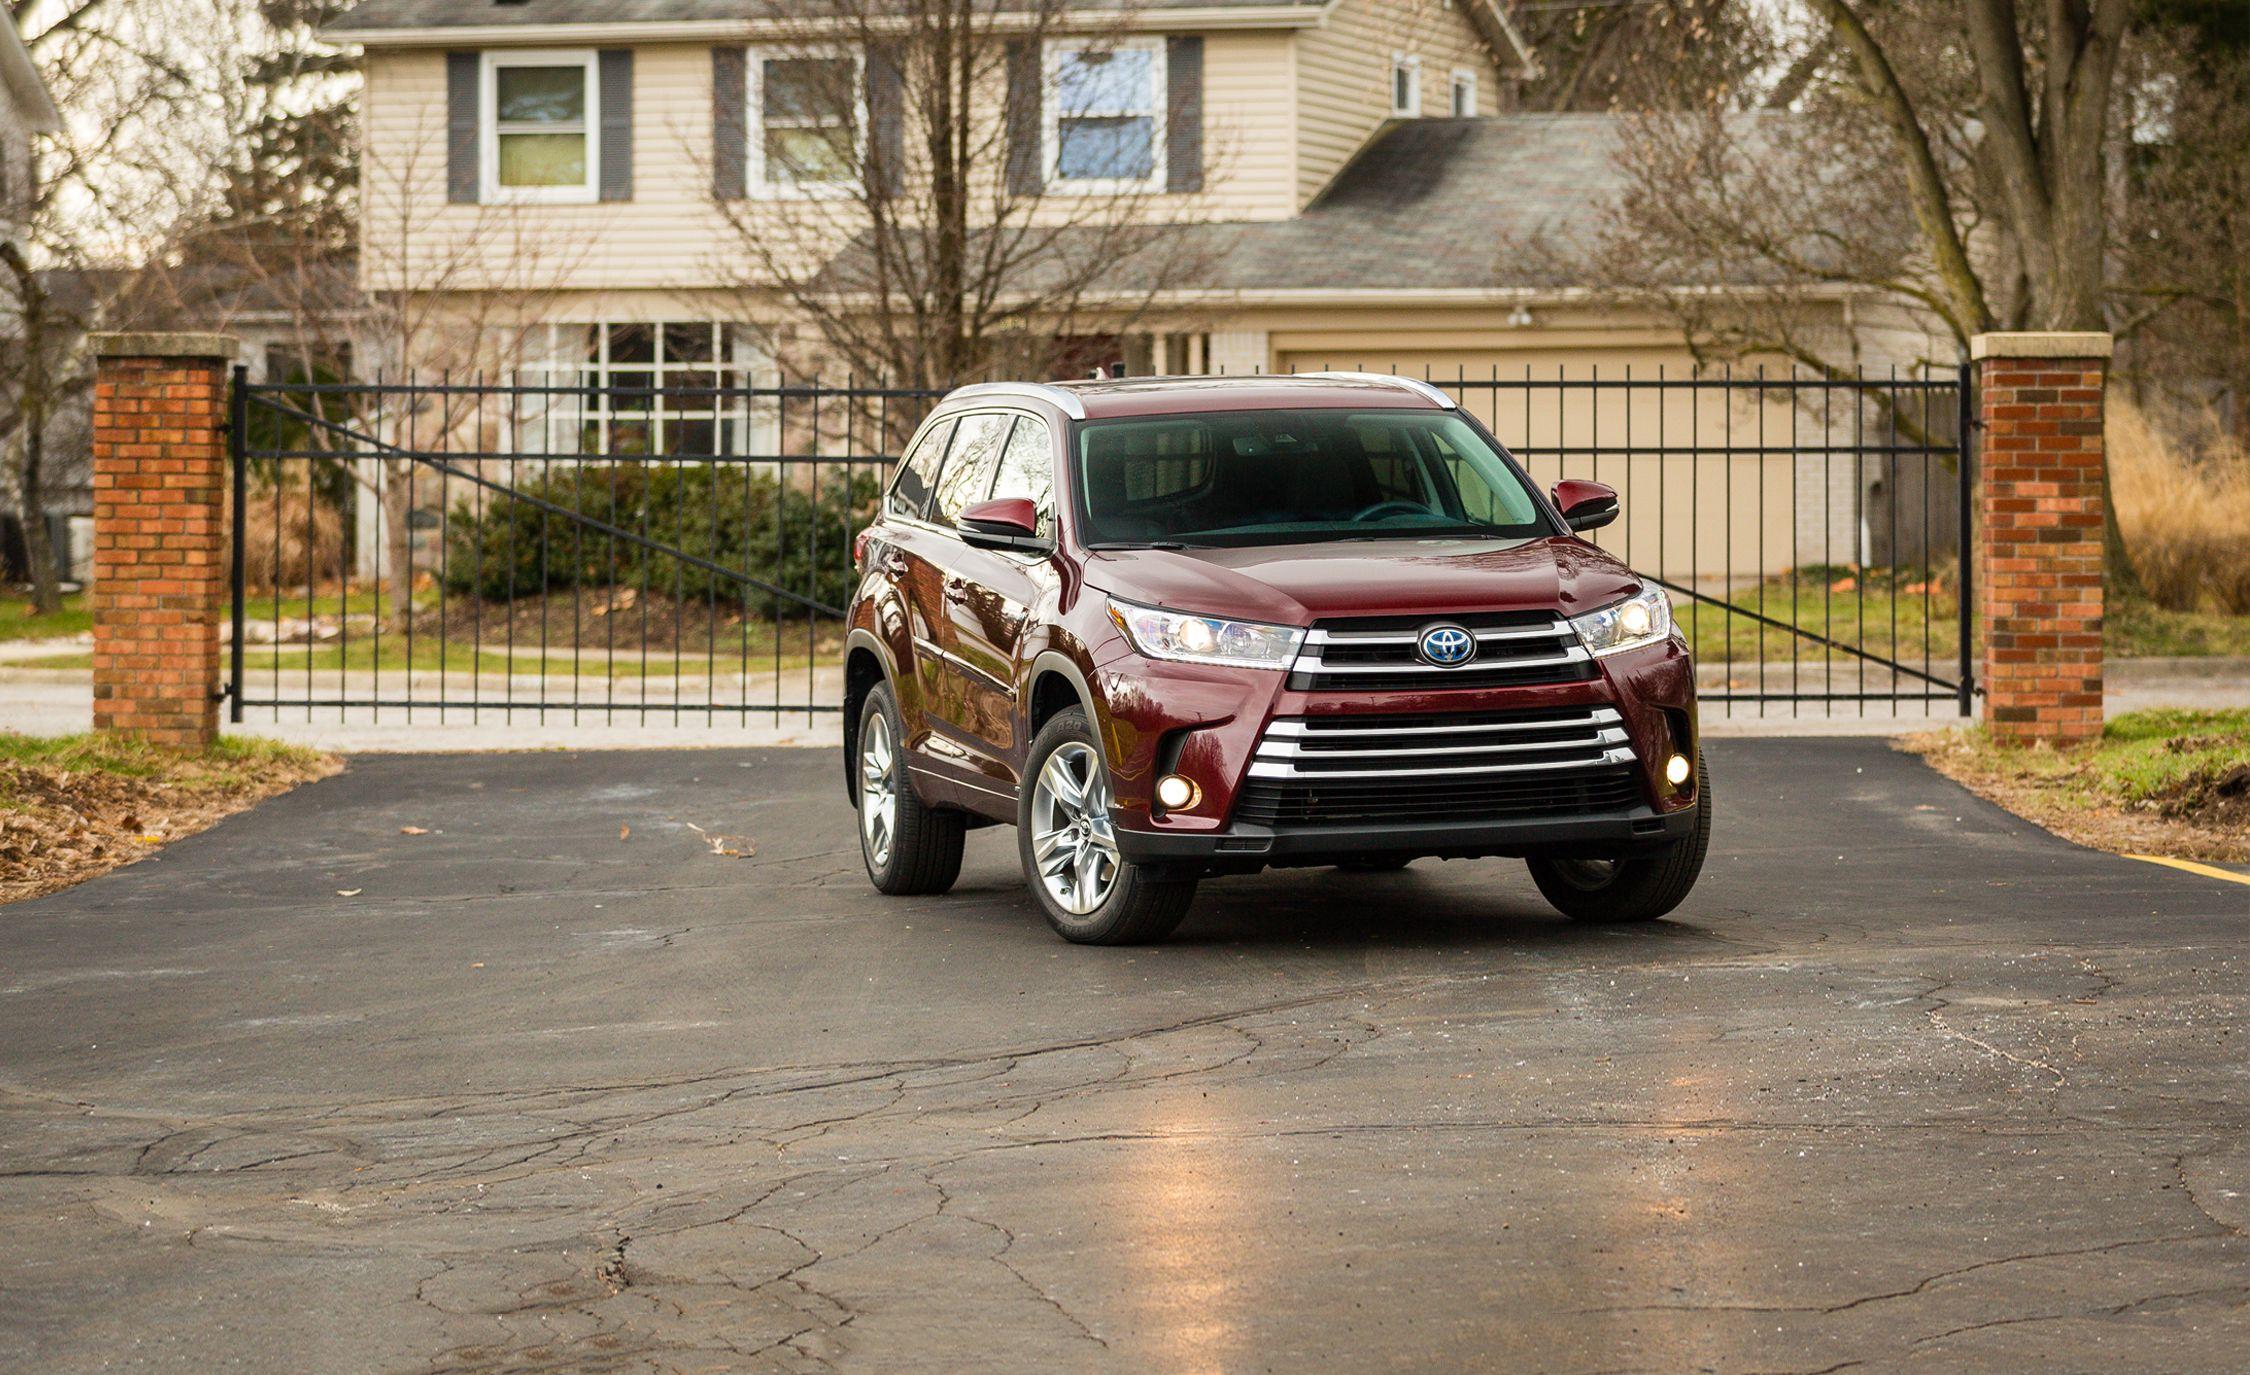 Toyota Highlander Reviews Toyota Highlander Price Photos And Specs Car And Driver